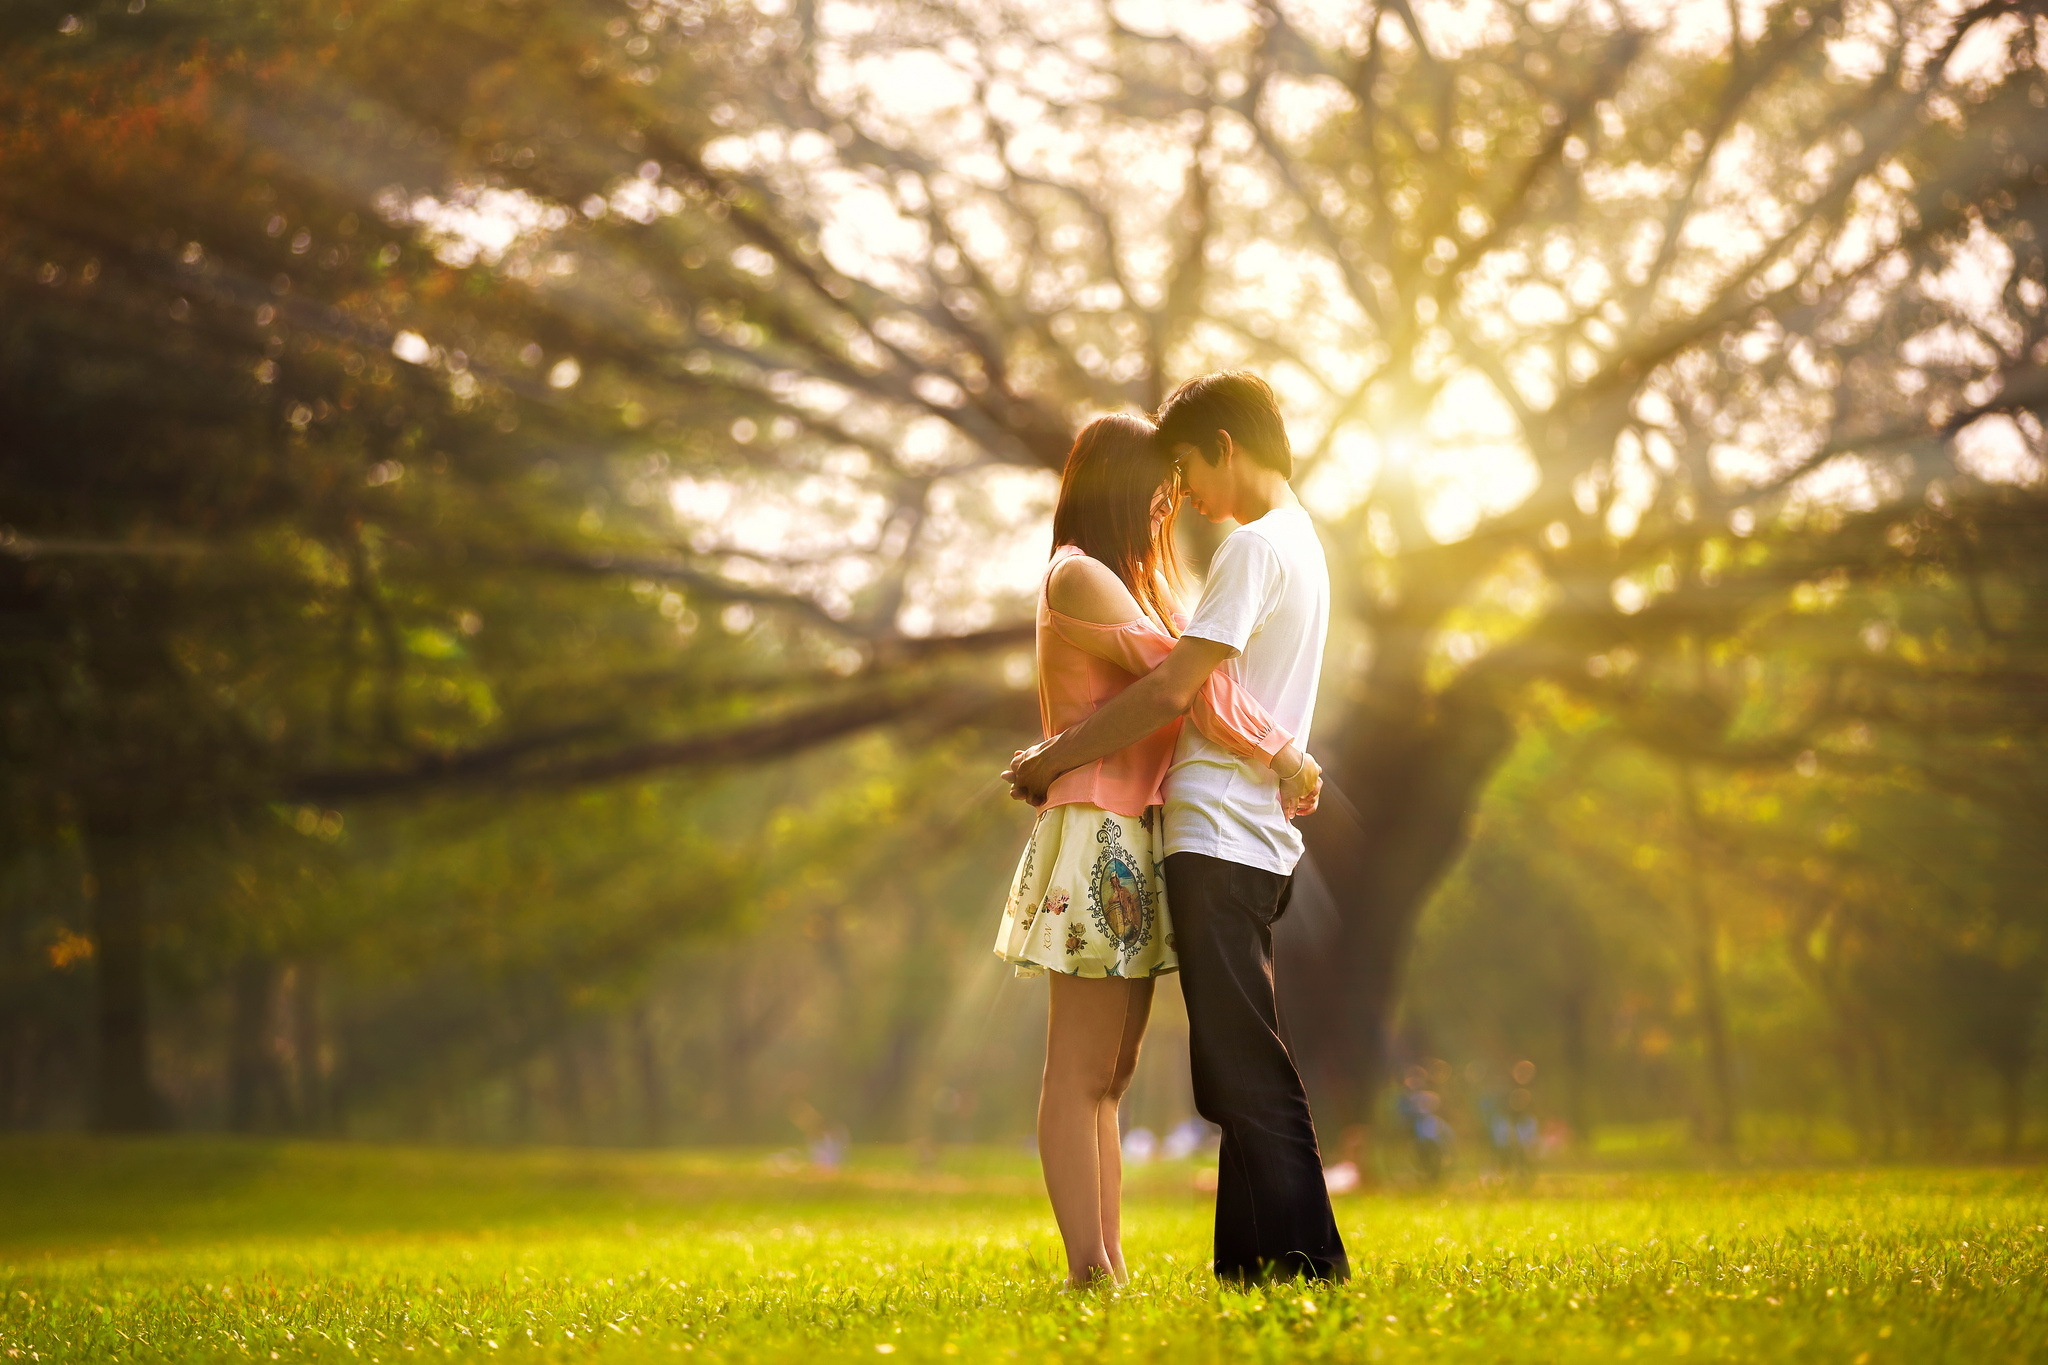 Картинки парень и девушка летом